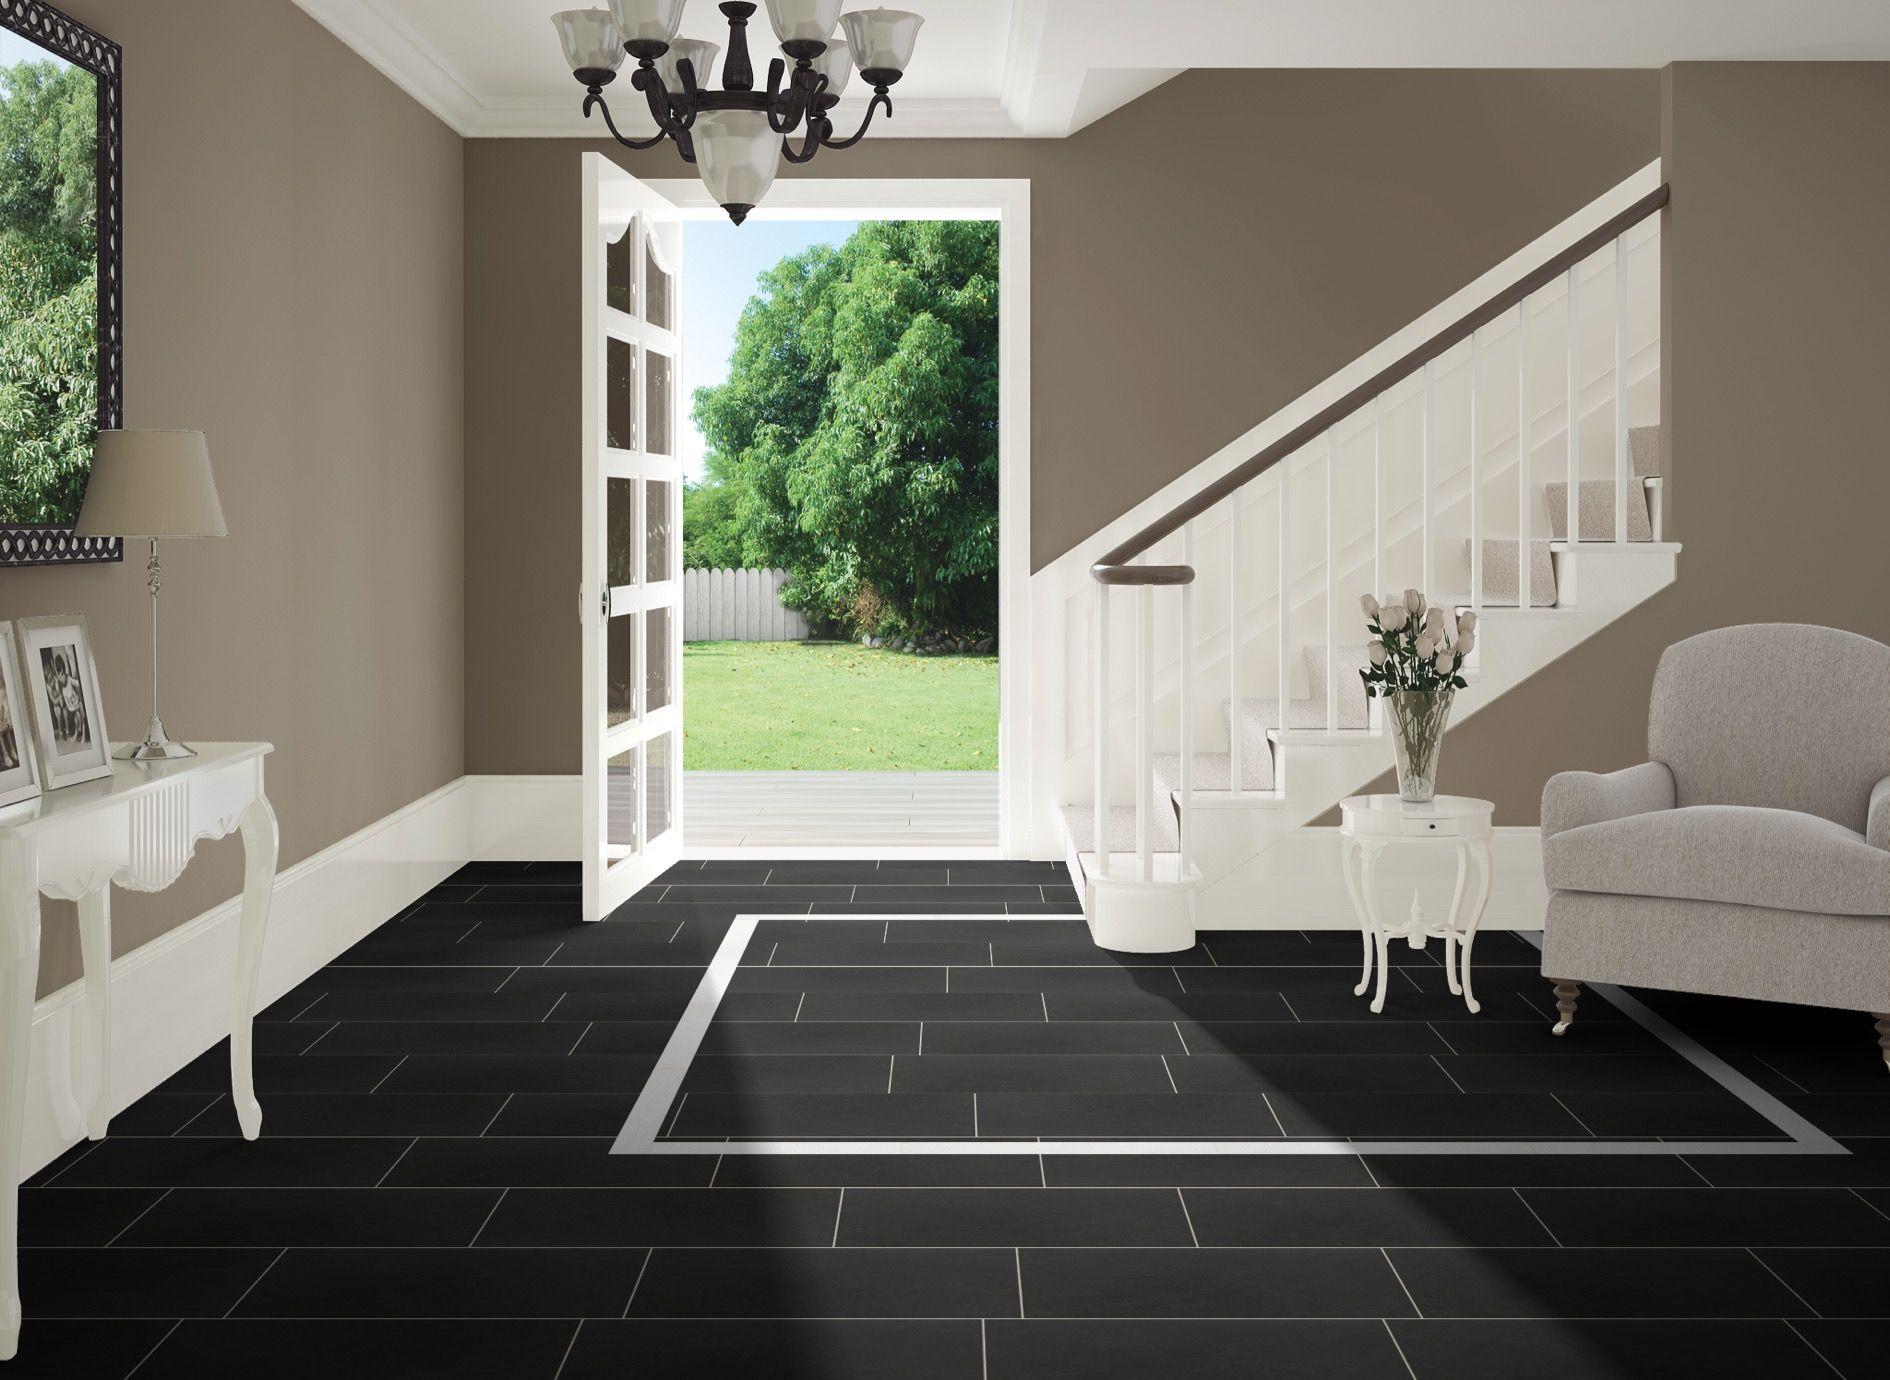 Anatolia Lobby Black And White Tile  Arley Evolution Tile Design New Black And White Tile Designs For Kitchens Inspiration Design